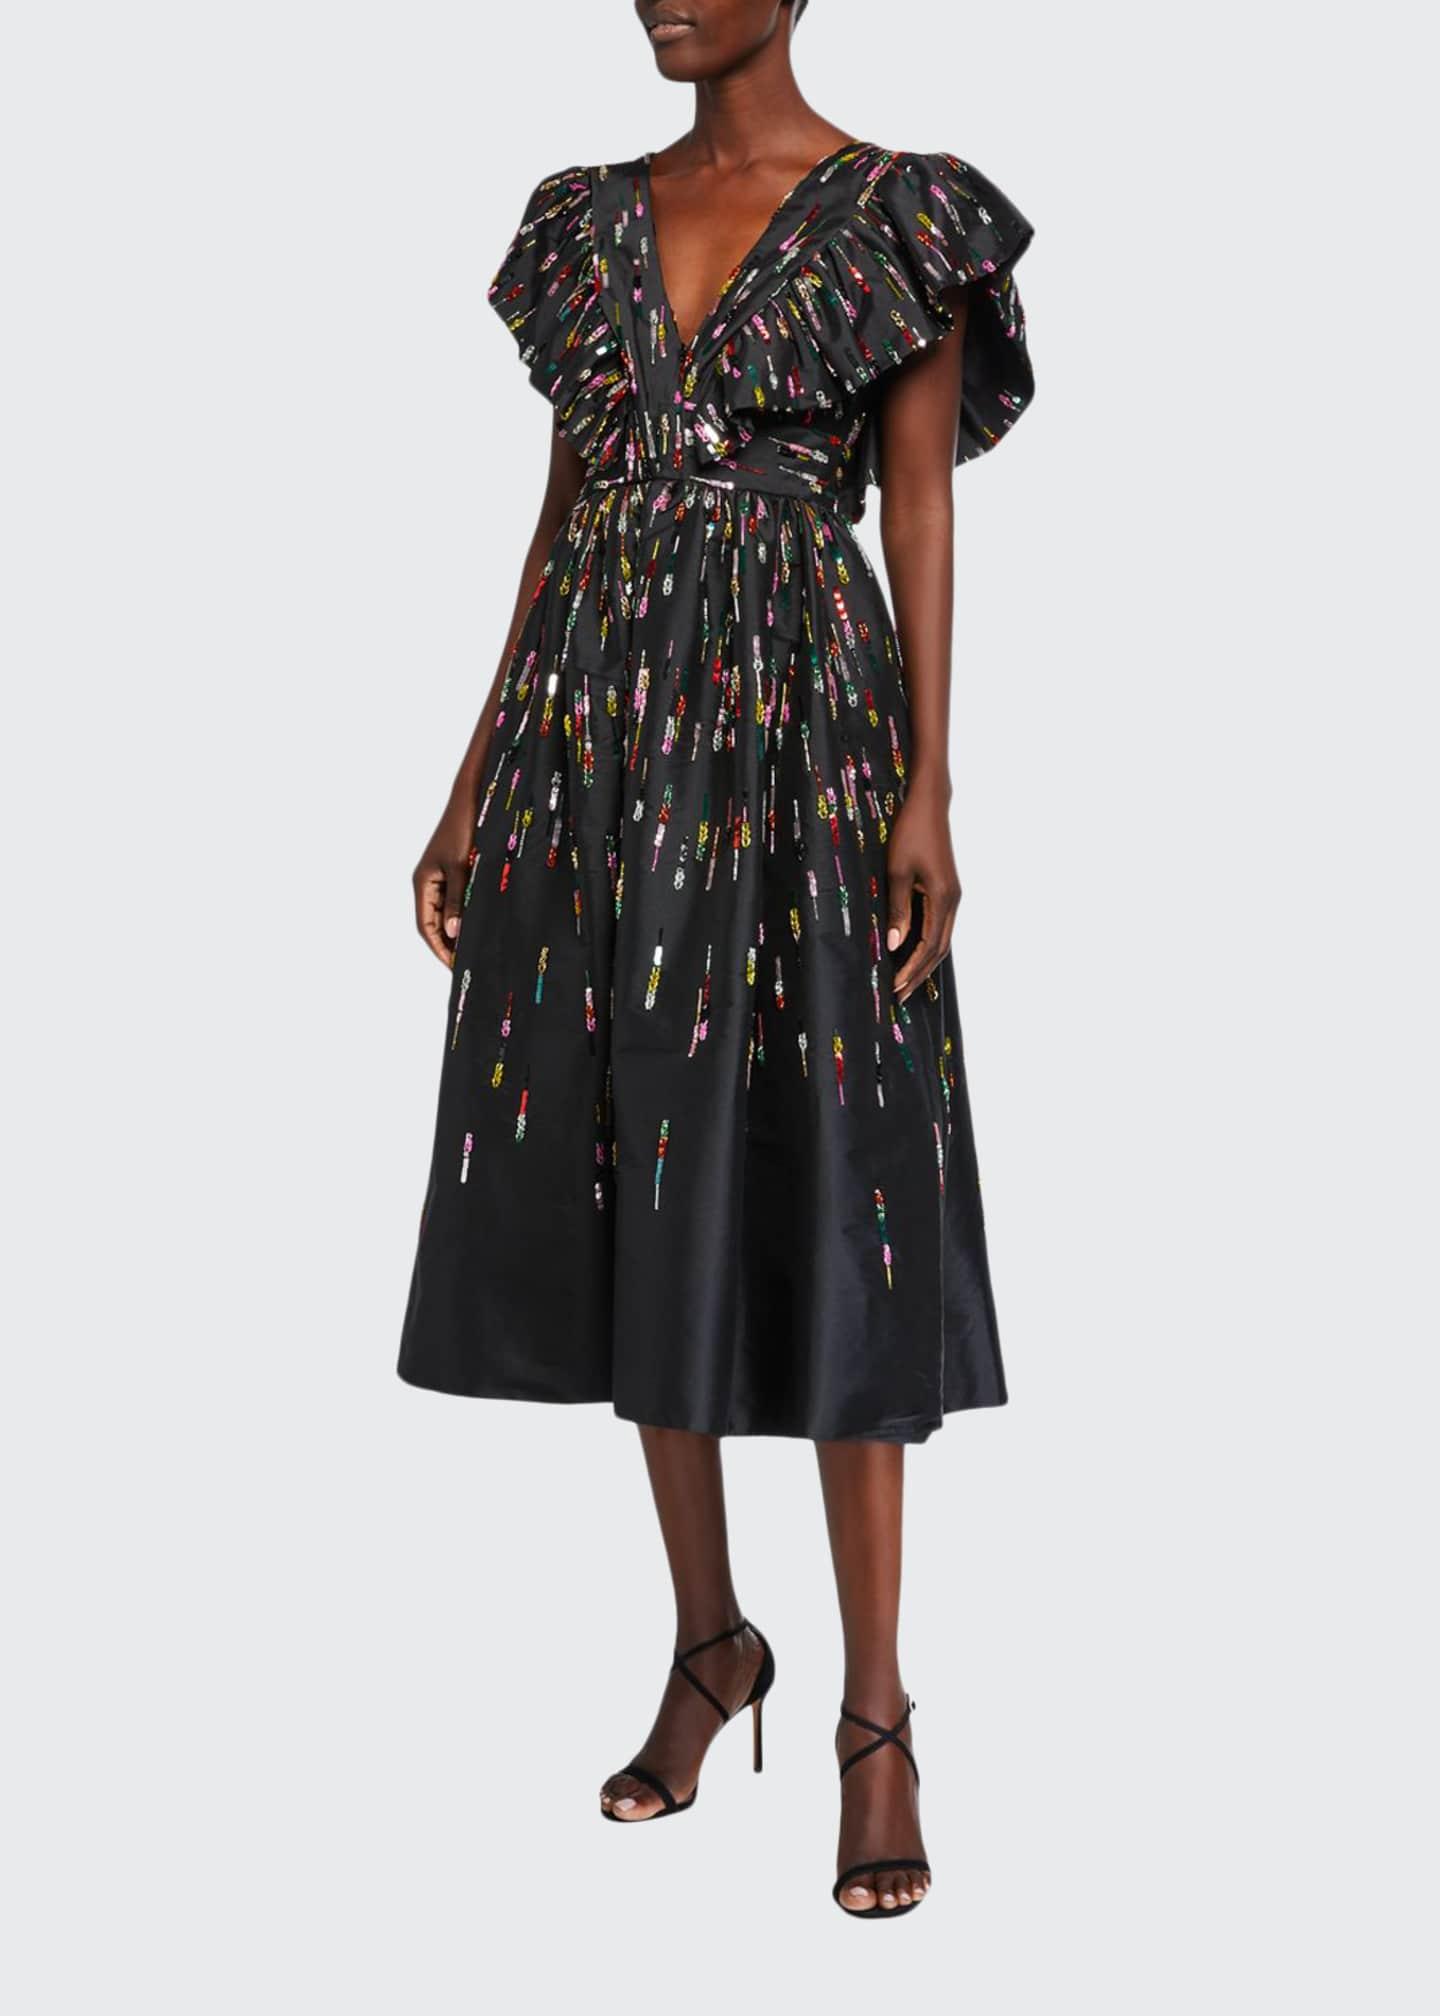 Monique Lhuillier Fluttered V-Neck Midi Dress